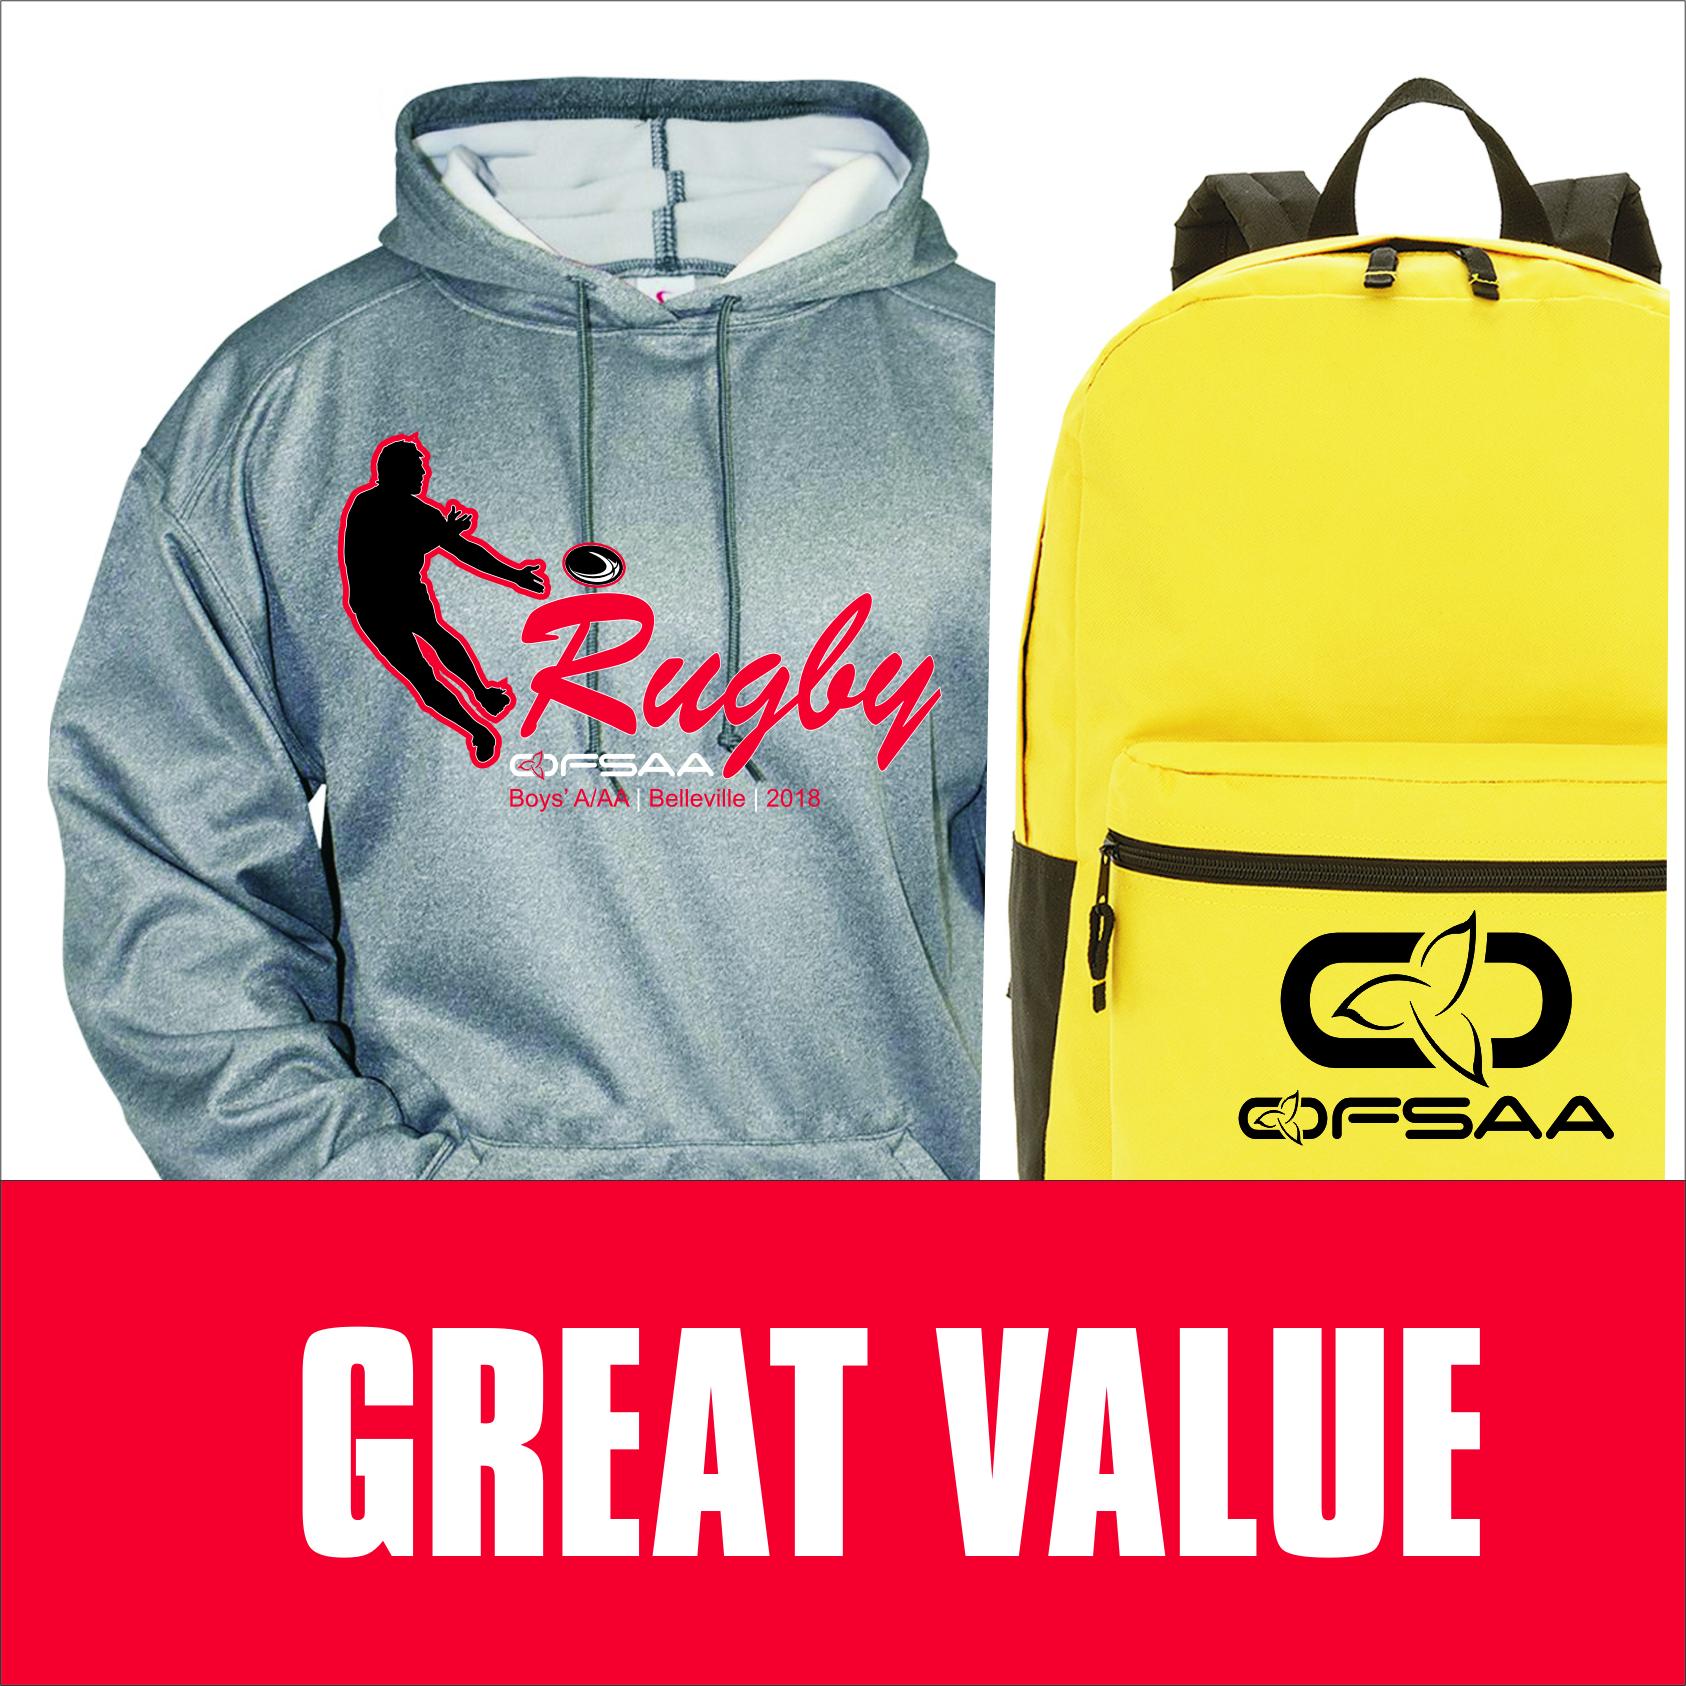 2018 Boys A AA Rugby Bag bundle.jpg